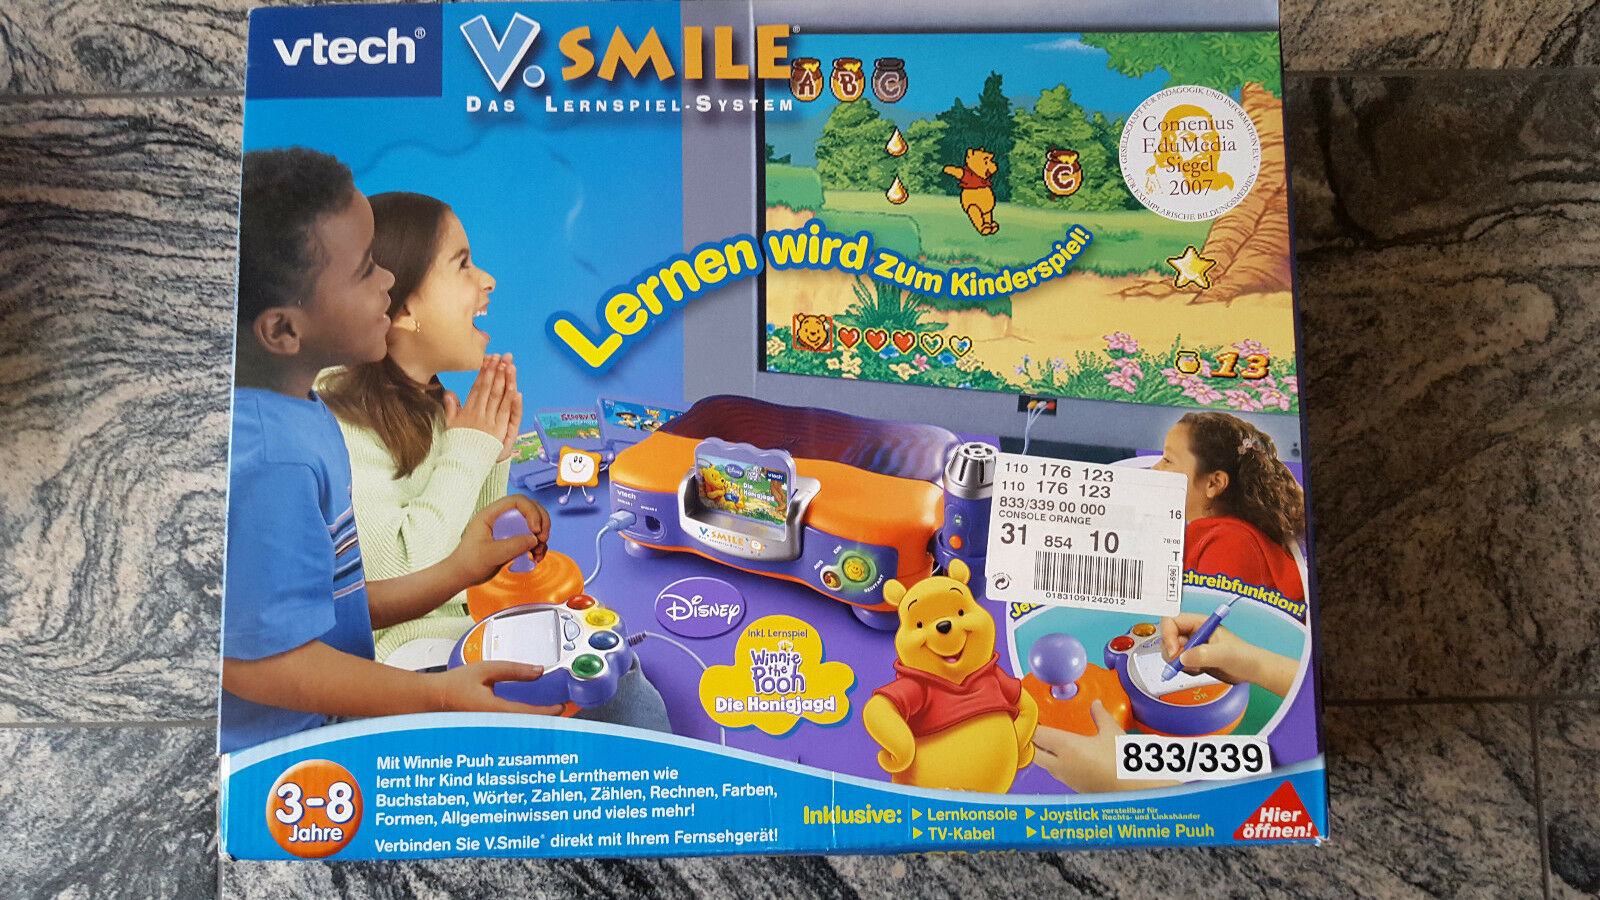 Vtech Vsmile Konsole plus 5 Spiele, gebraucht; OVP; gratis Origin Vtech Netzteil